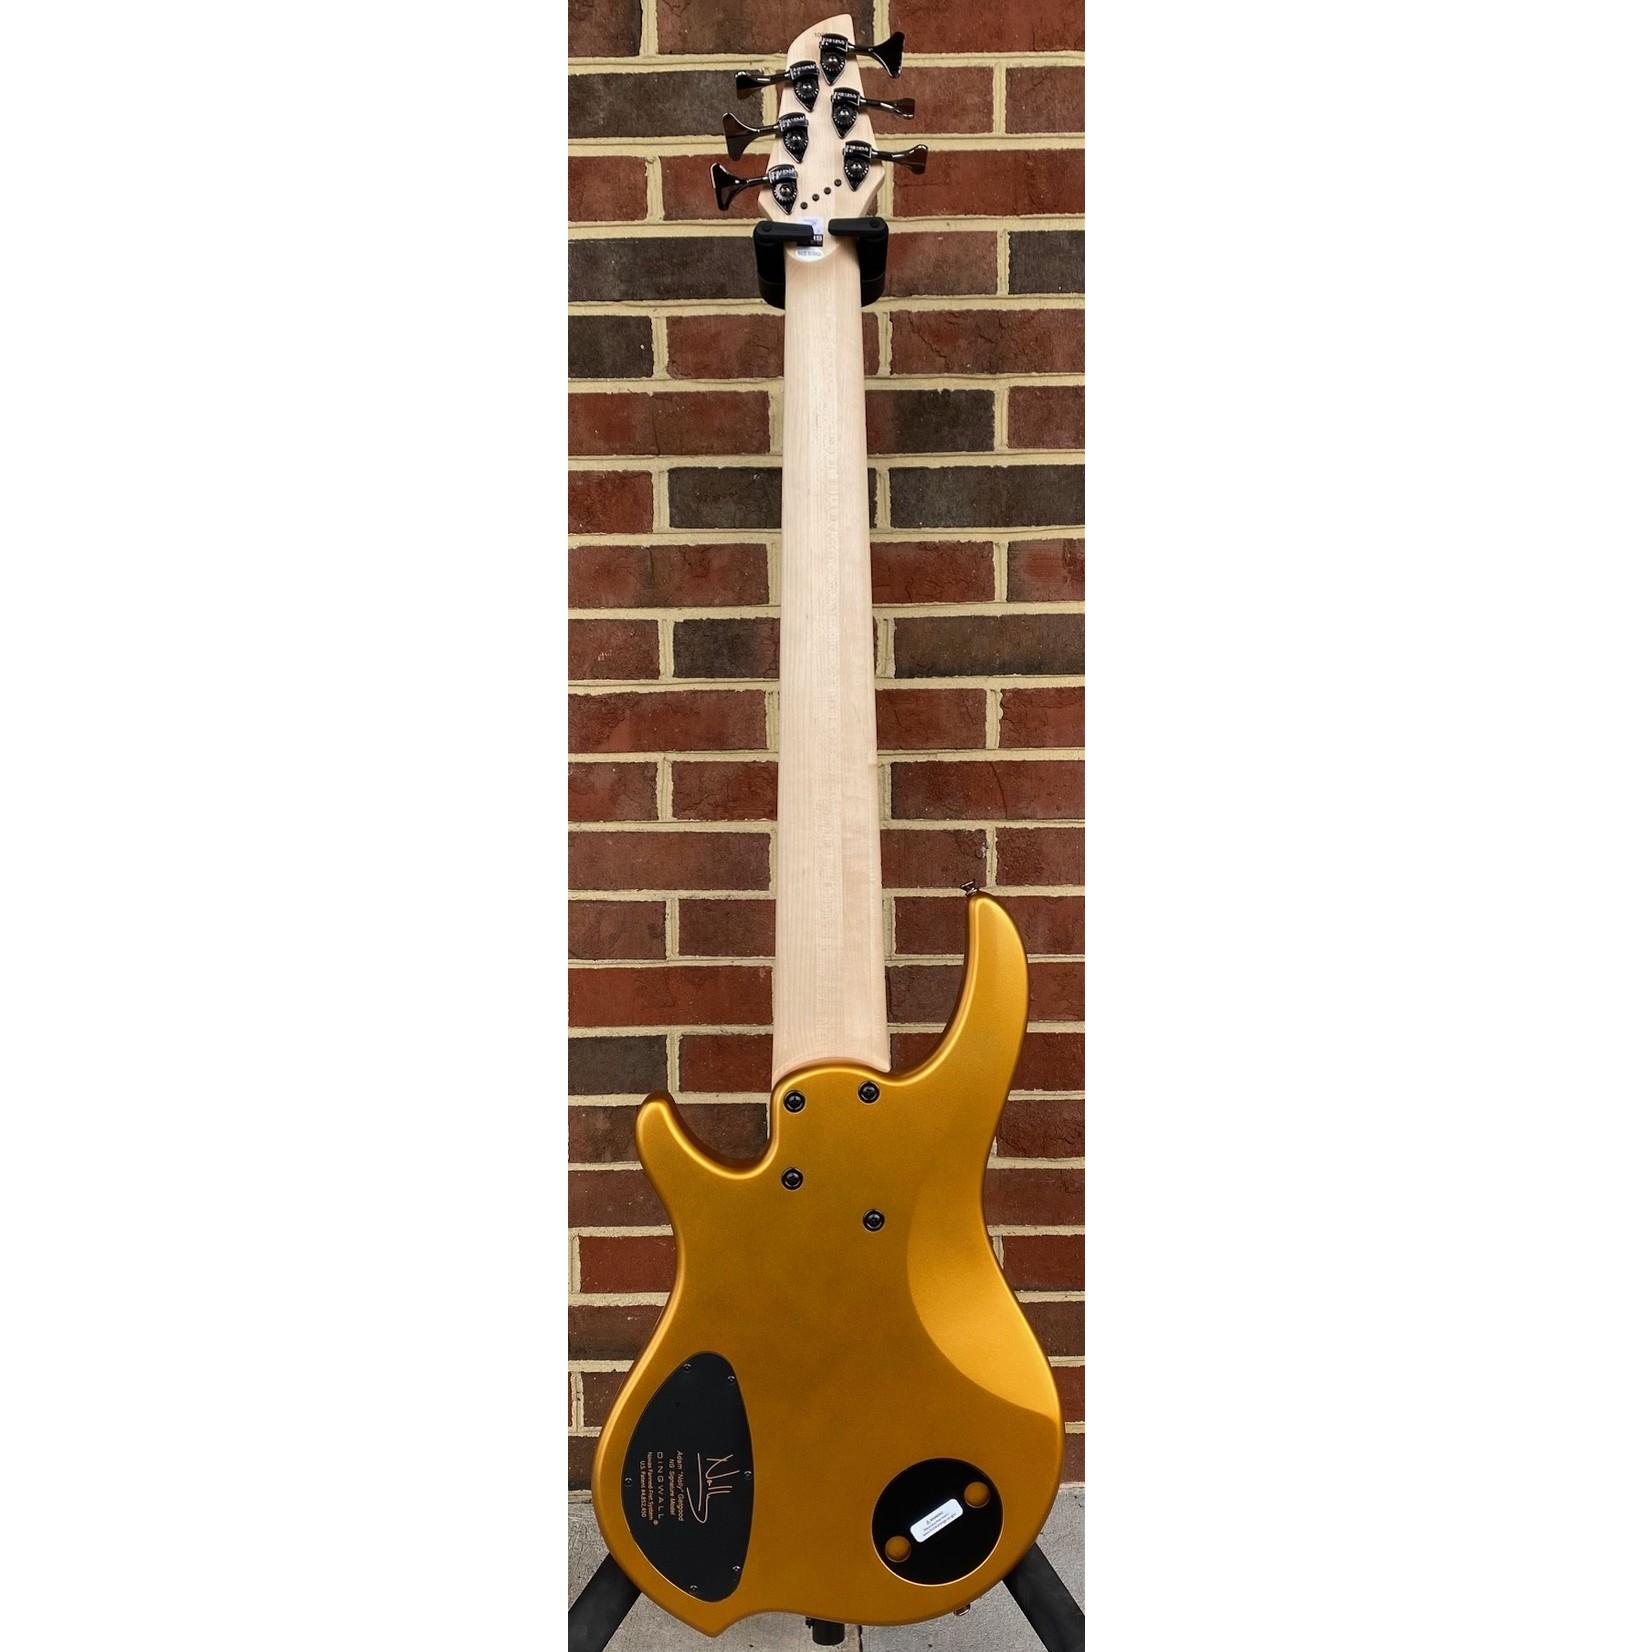 Dingwall Dingwall NG3 6-String, Matte Gold Metallic, Maple Fretboard, Matching Headstock, Dingwall Gig Bag, SN# 10063